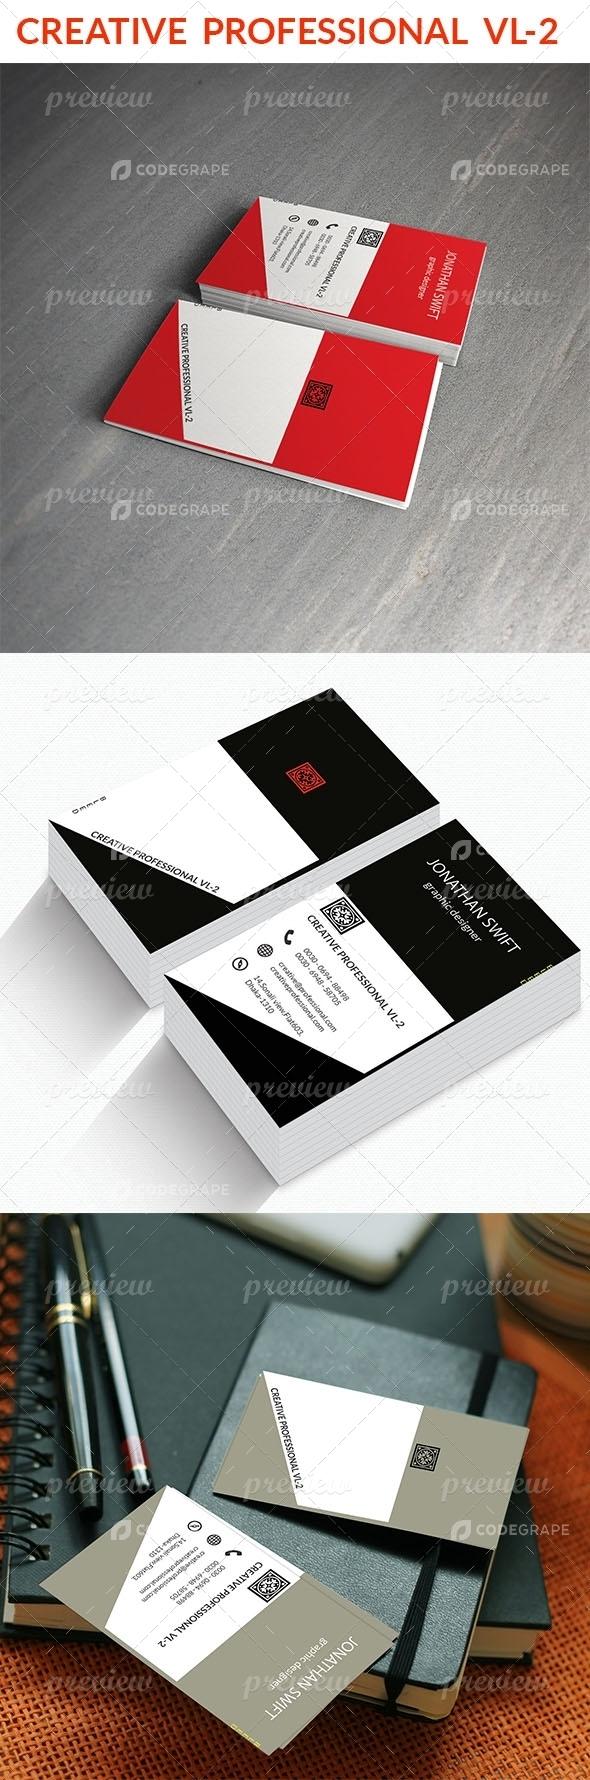 Creative Professional VL- 2 Business card